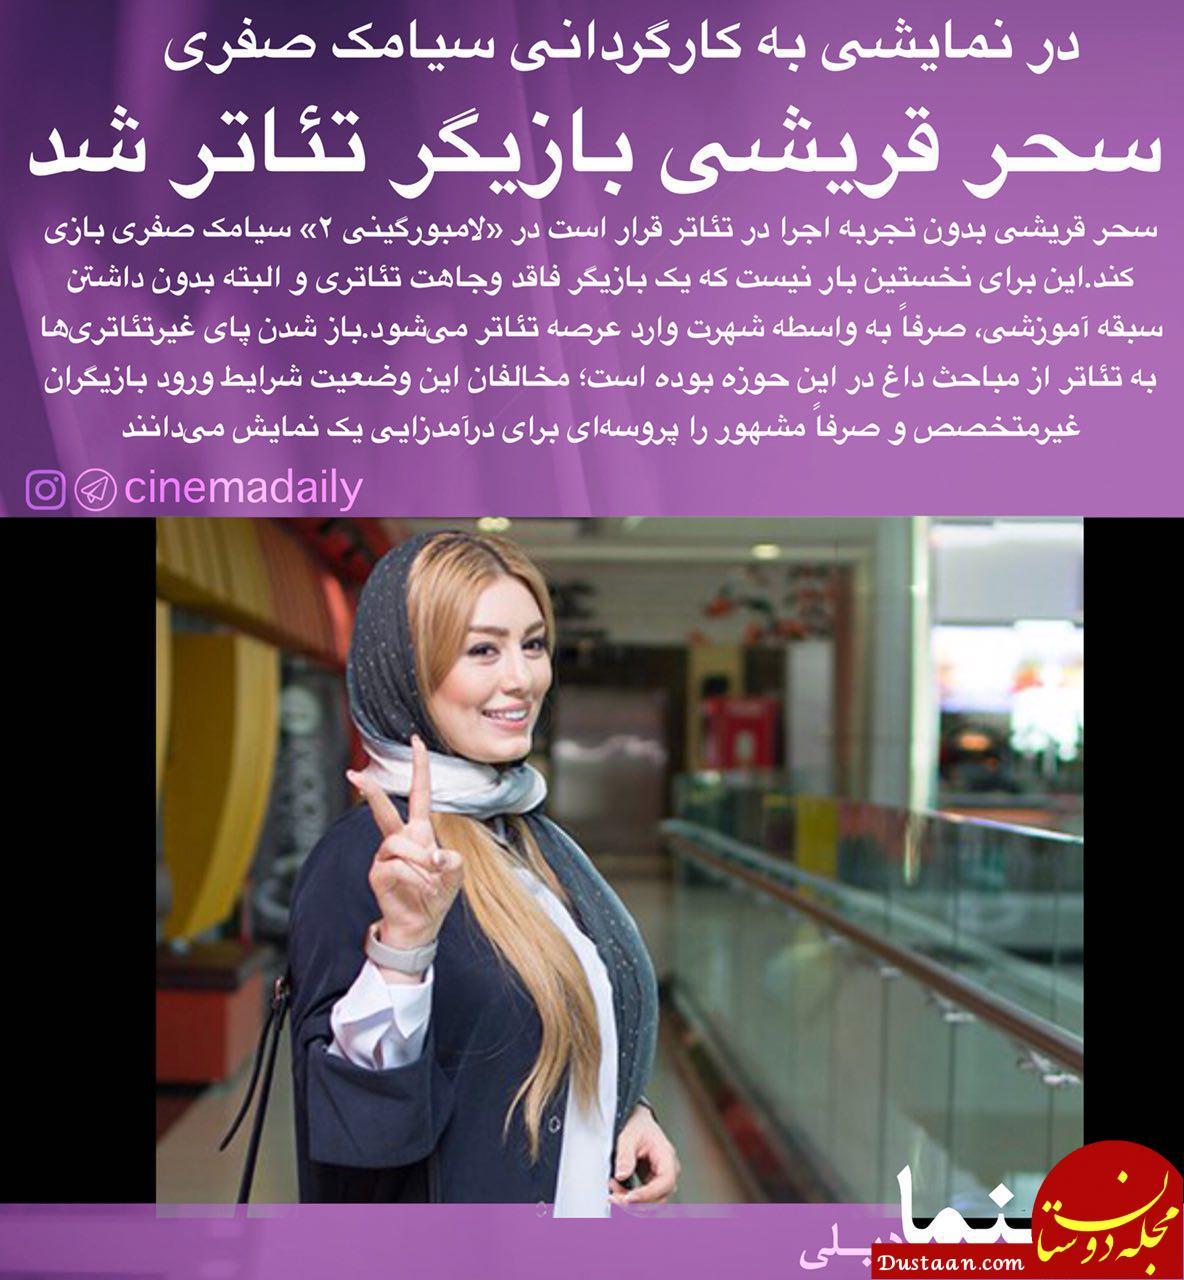 www.dustaan.com سحر قریشی وارد تئاتر شد! +عکس